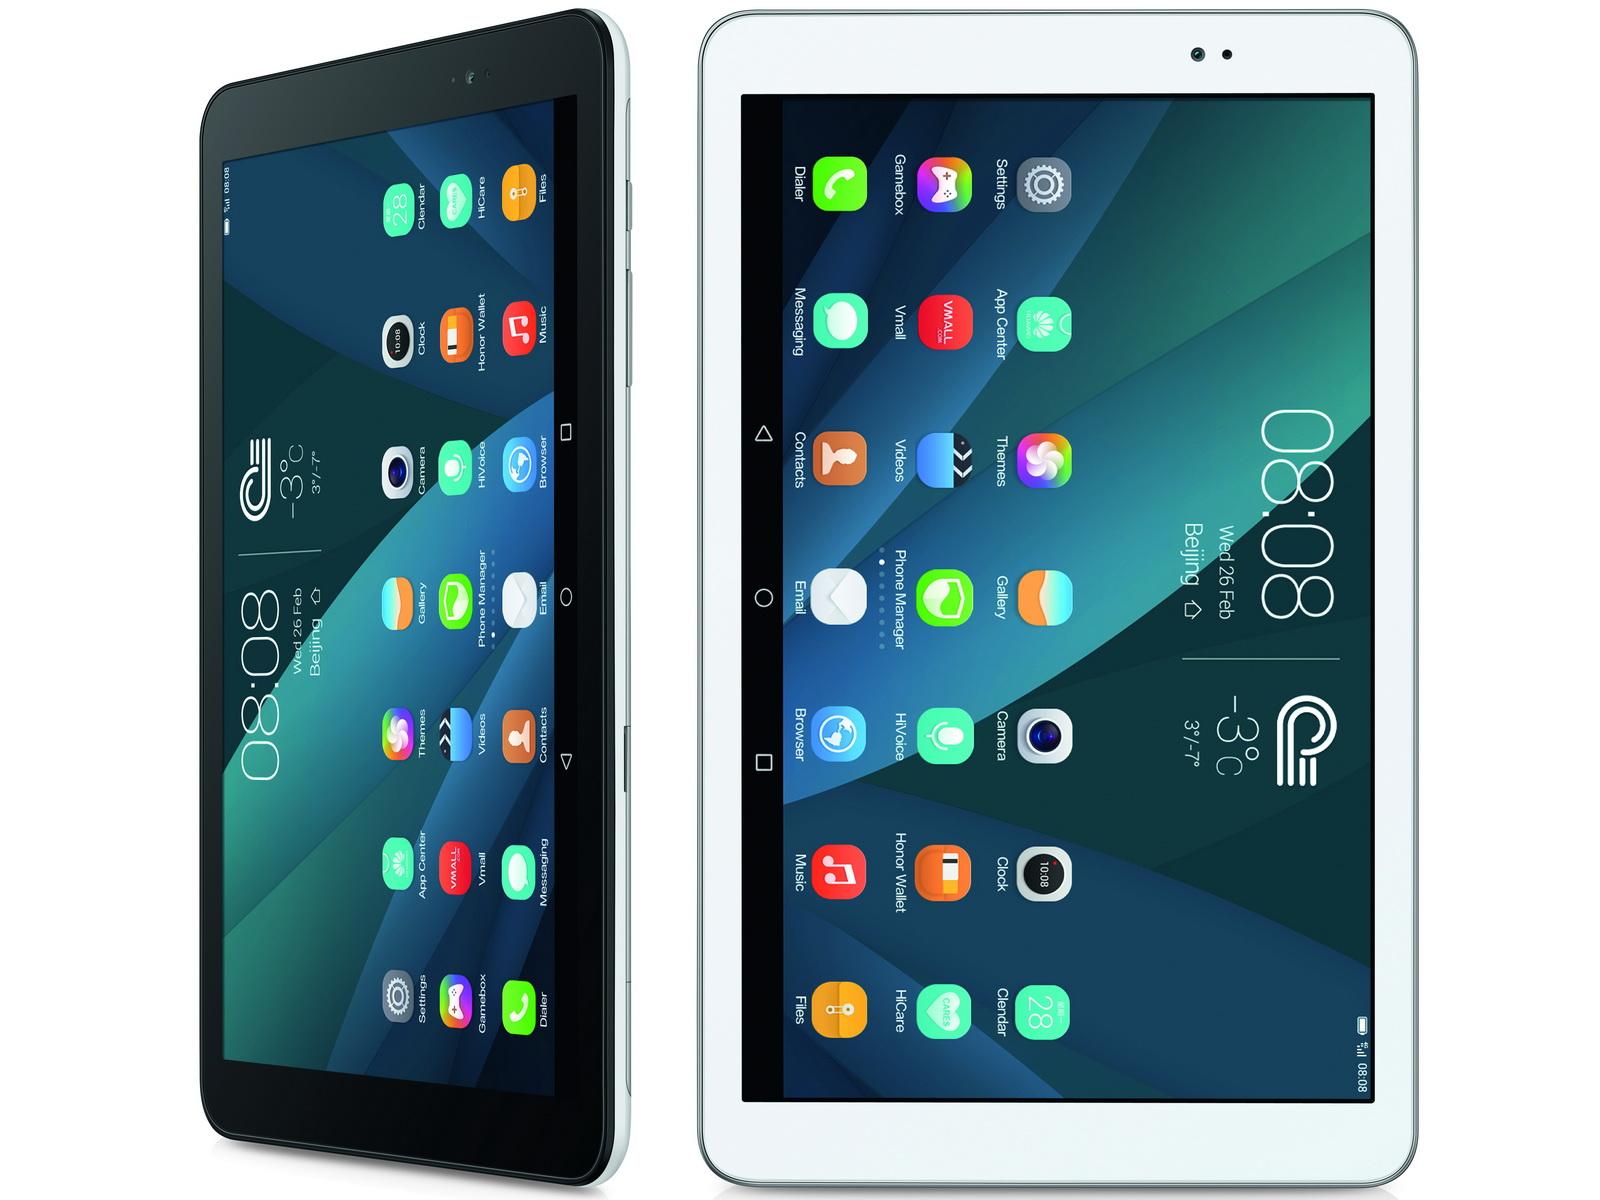 Tablets Huawei MediaPad T1 7.0 und T1 10